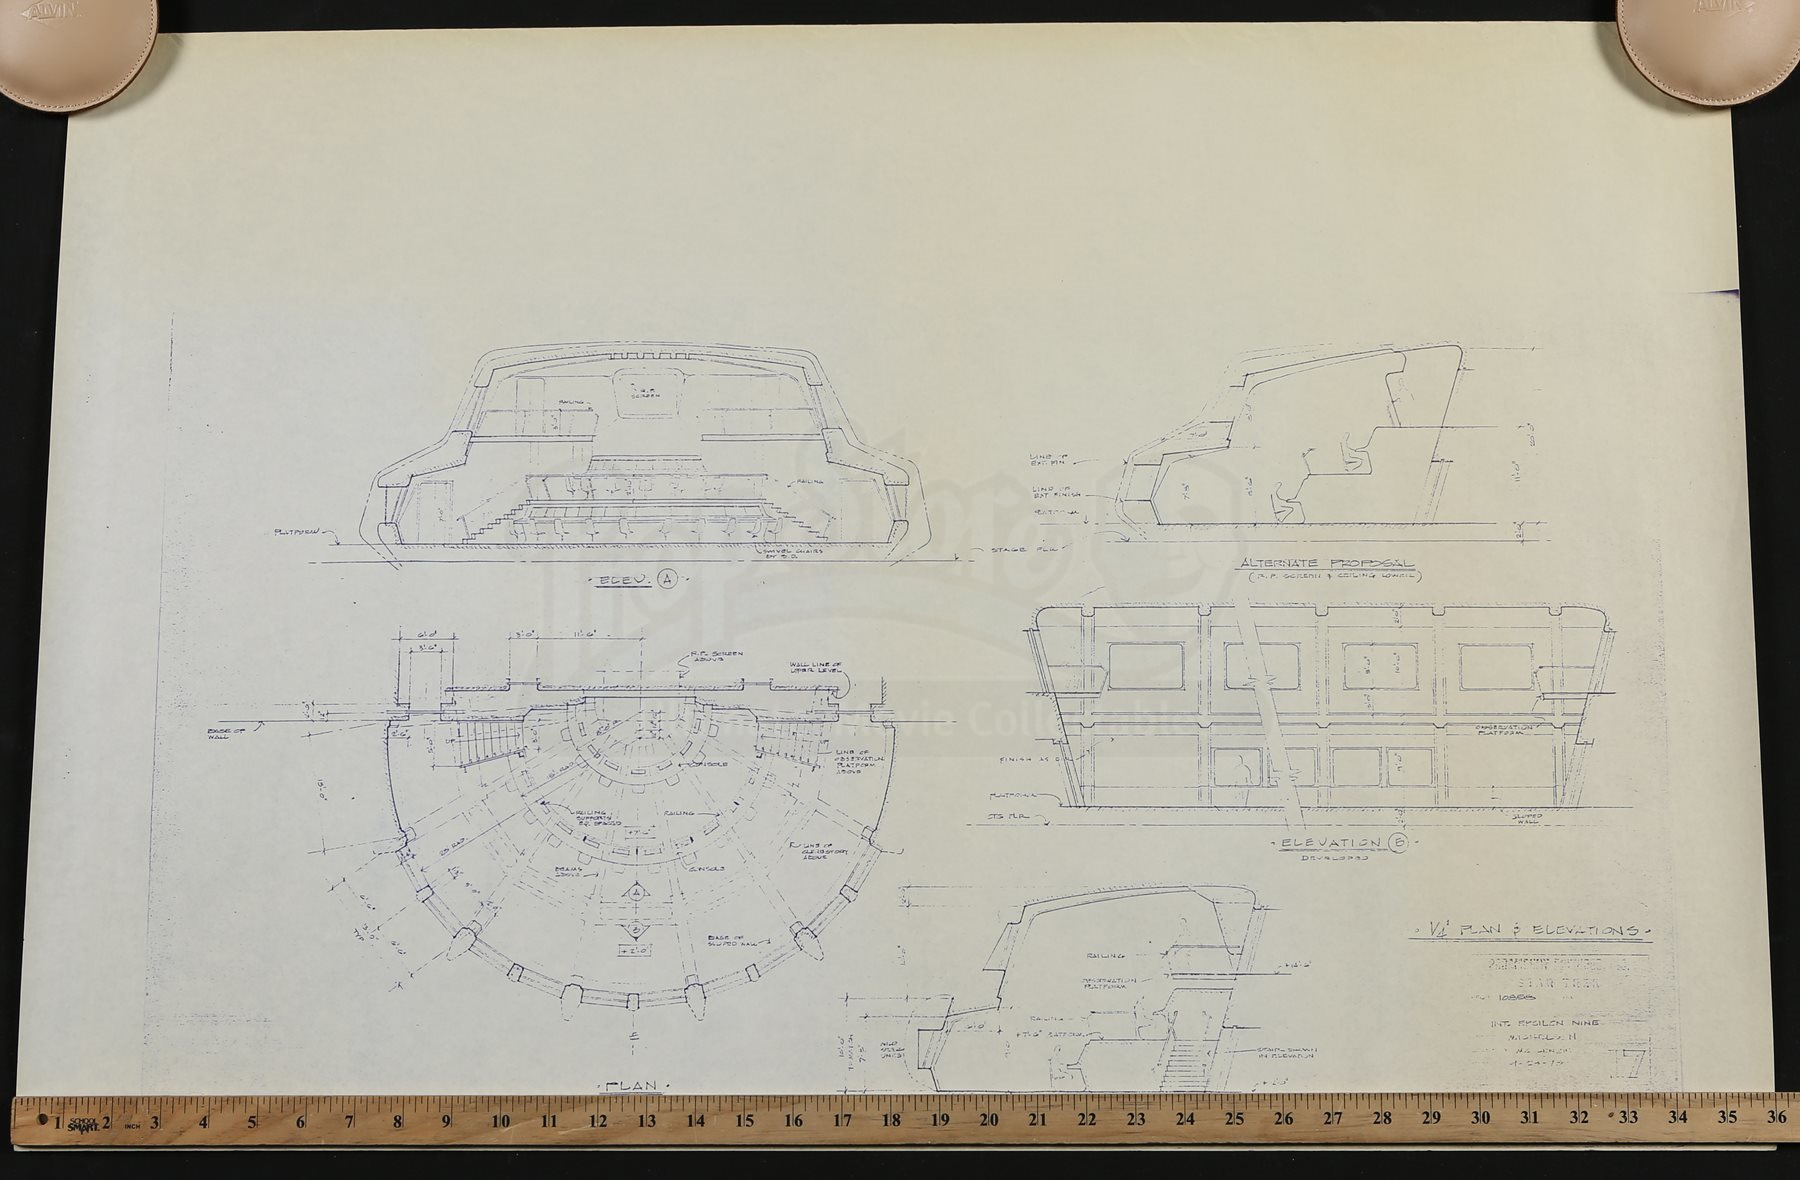 Star trek the motion picture epsilon nine interior for Blueprint cost